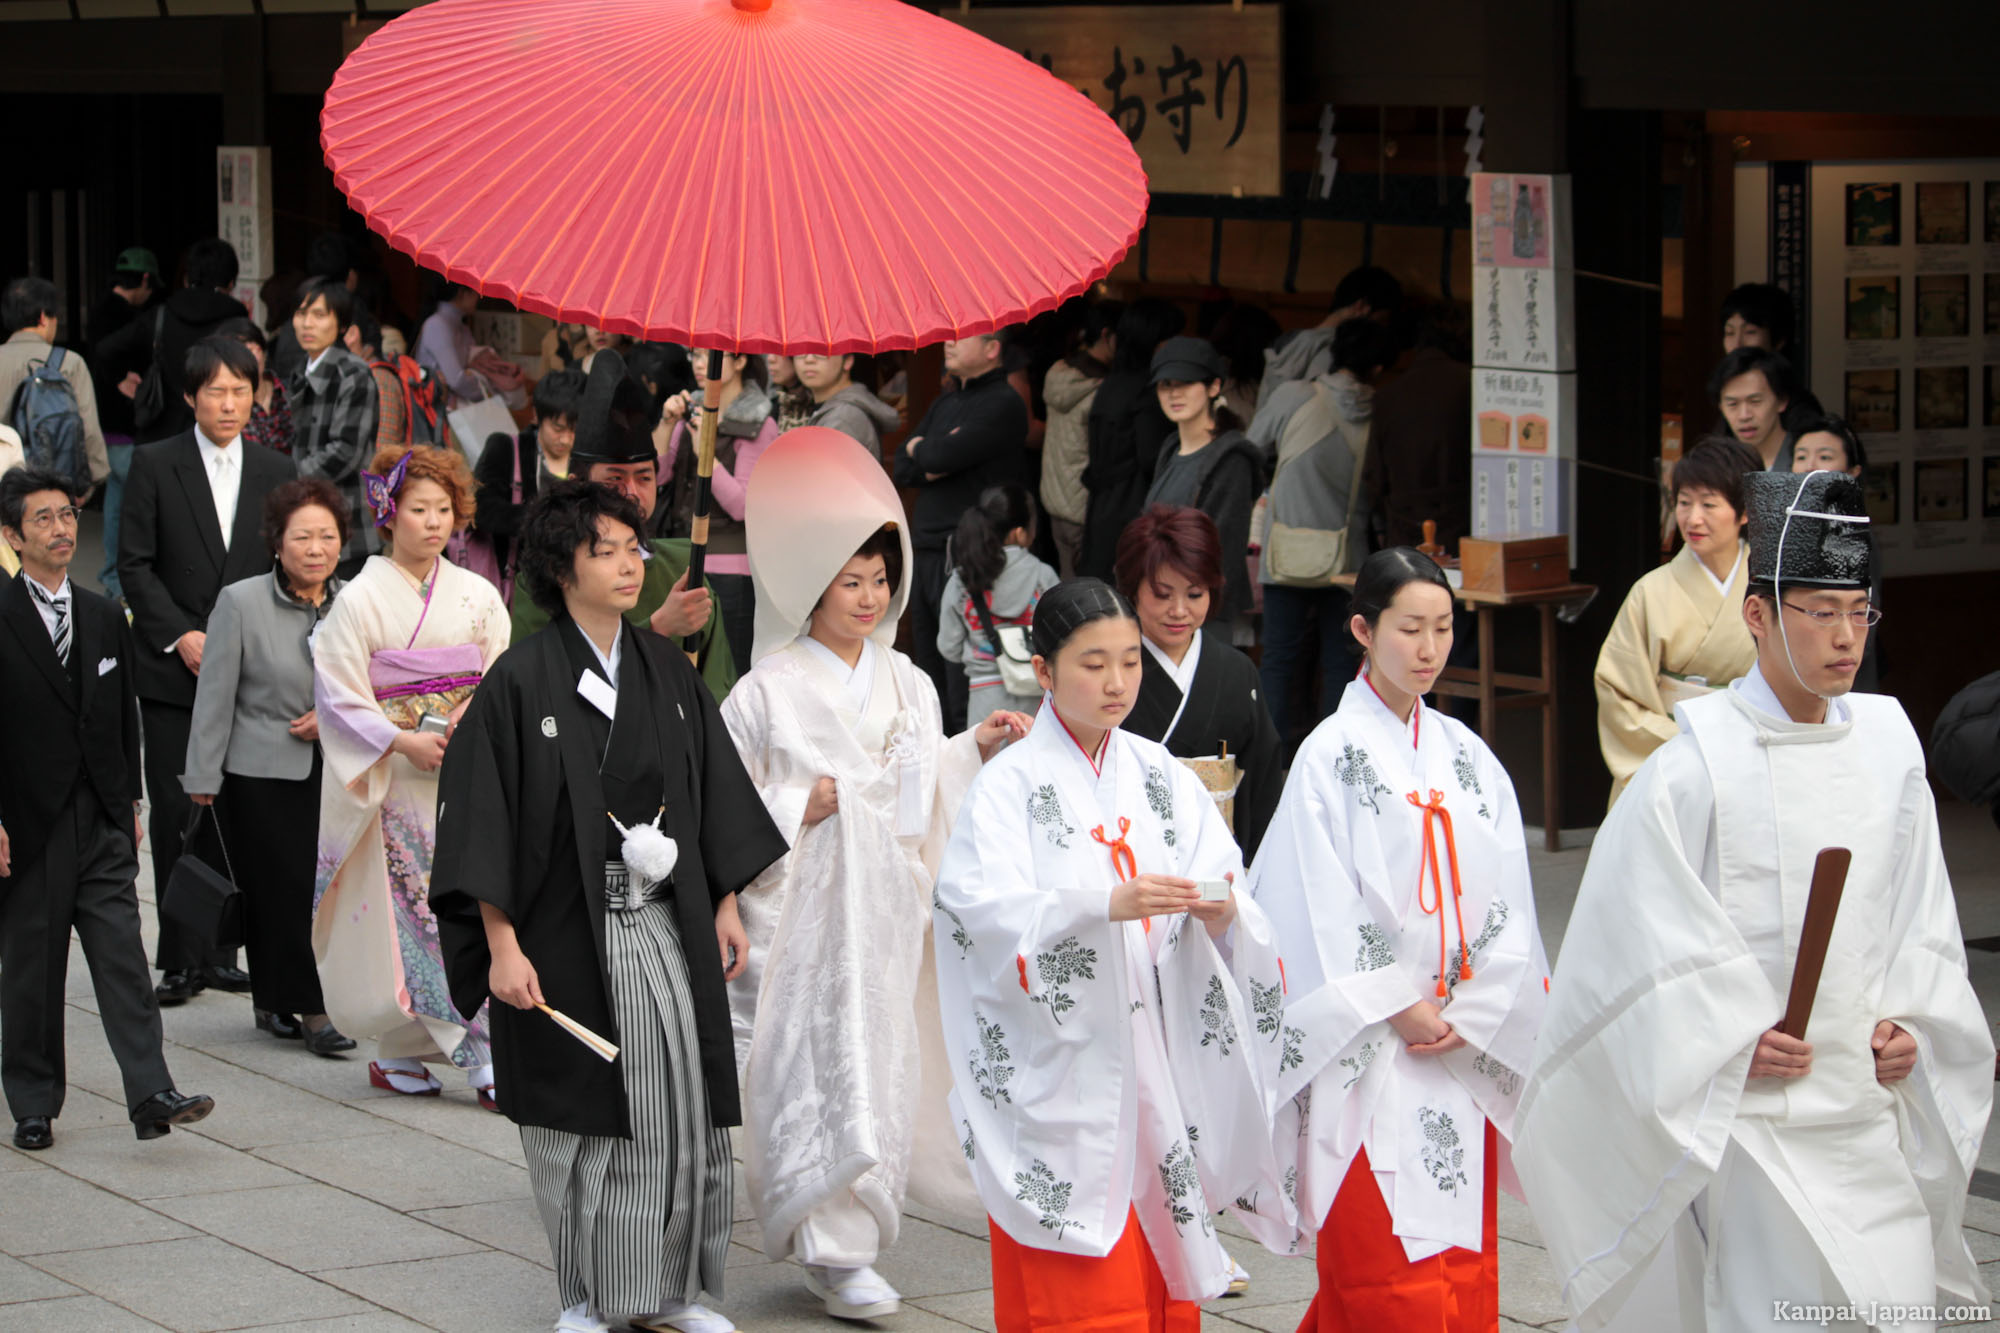 Christian Weddings in Japan Christians-style Weddings